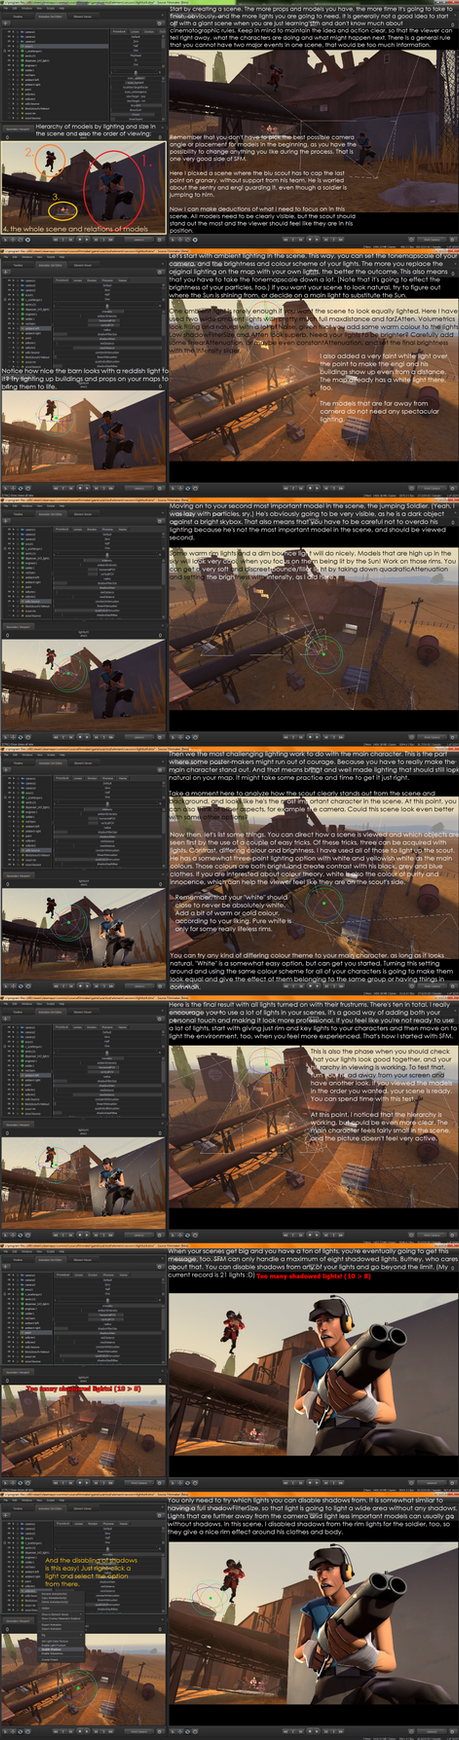 [SFM Tutorial] Scenebuild aspects part 1 by lolvcrtape